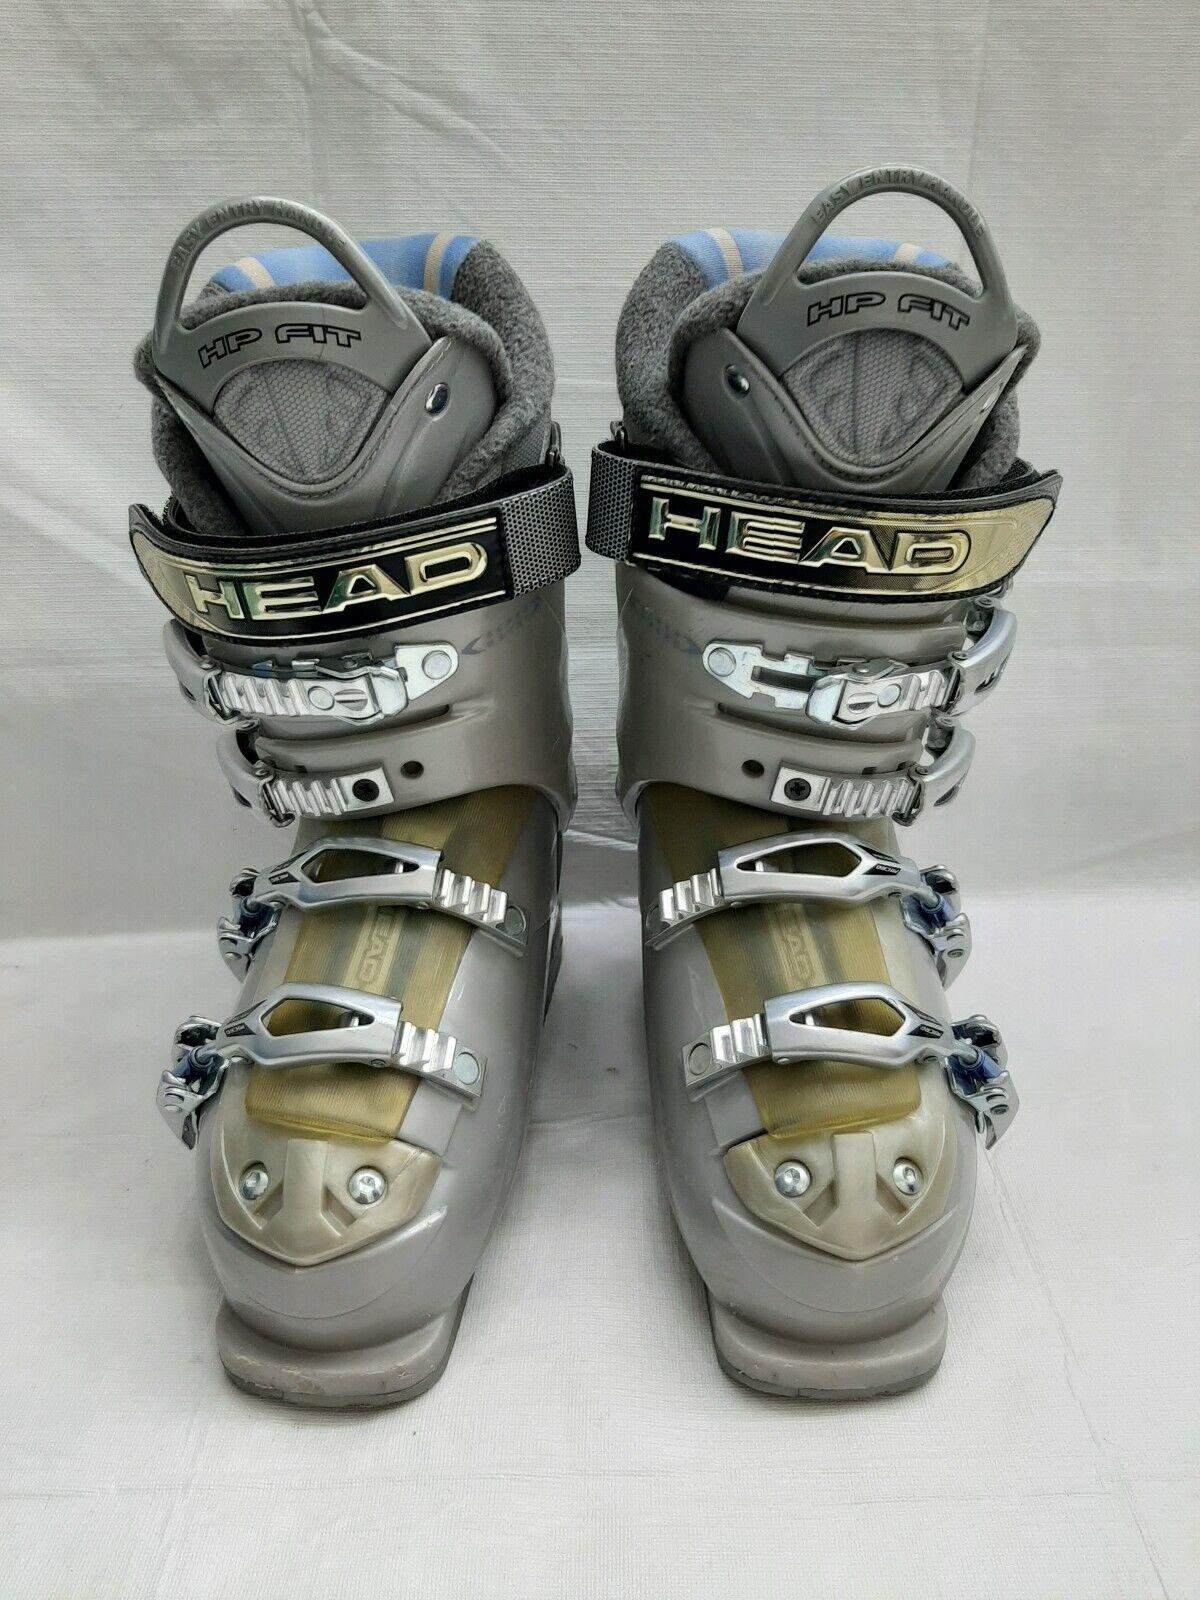 Head Edge 9.8 Silber 274mm ski Stiefel Größe 23-23.5, US 5 mens